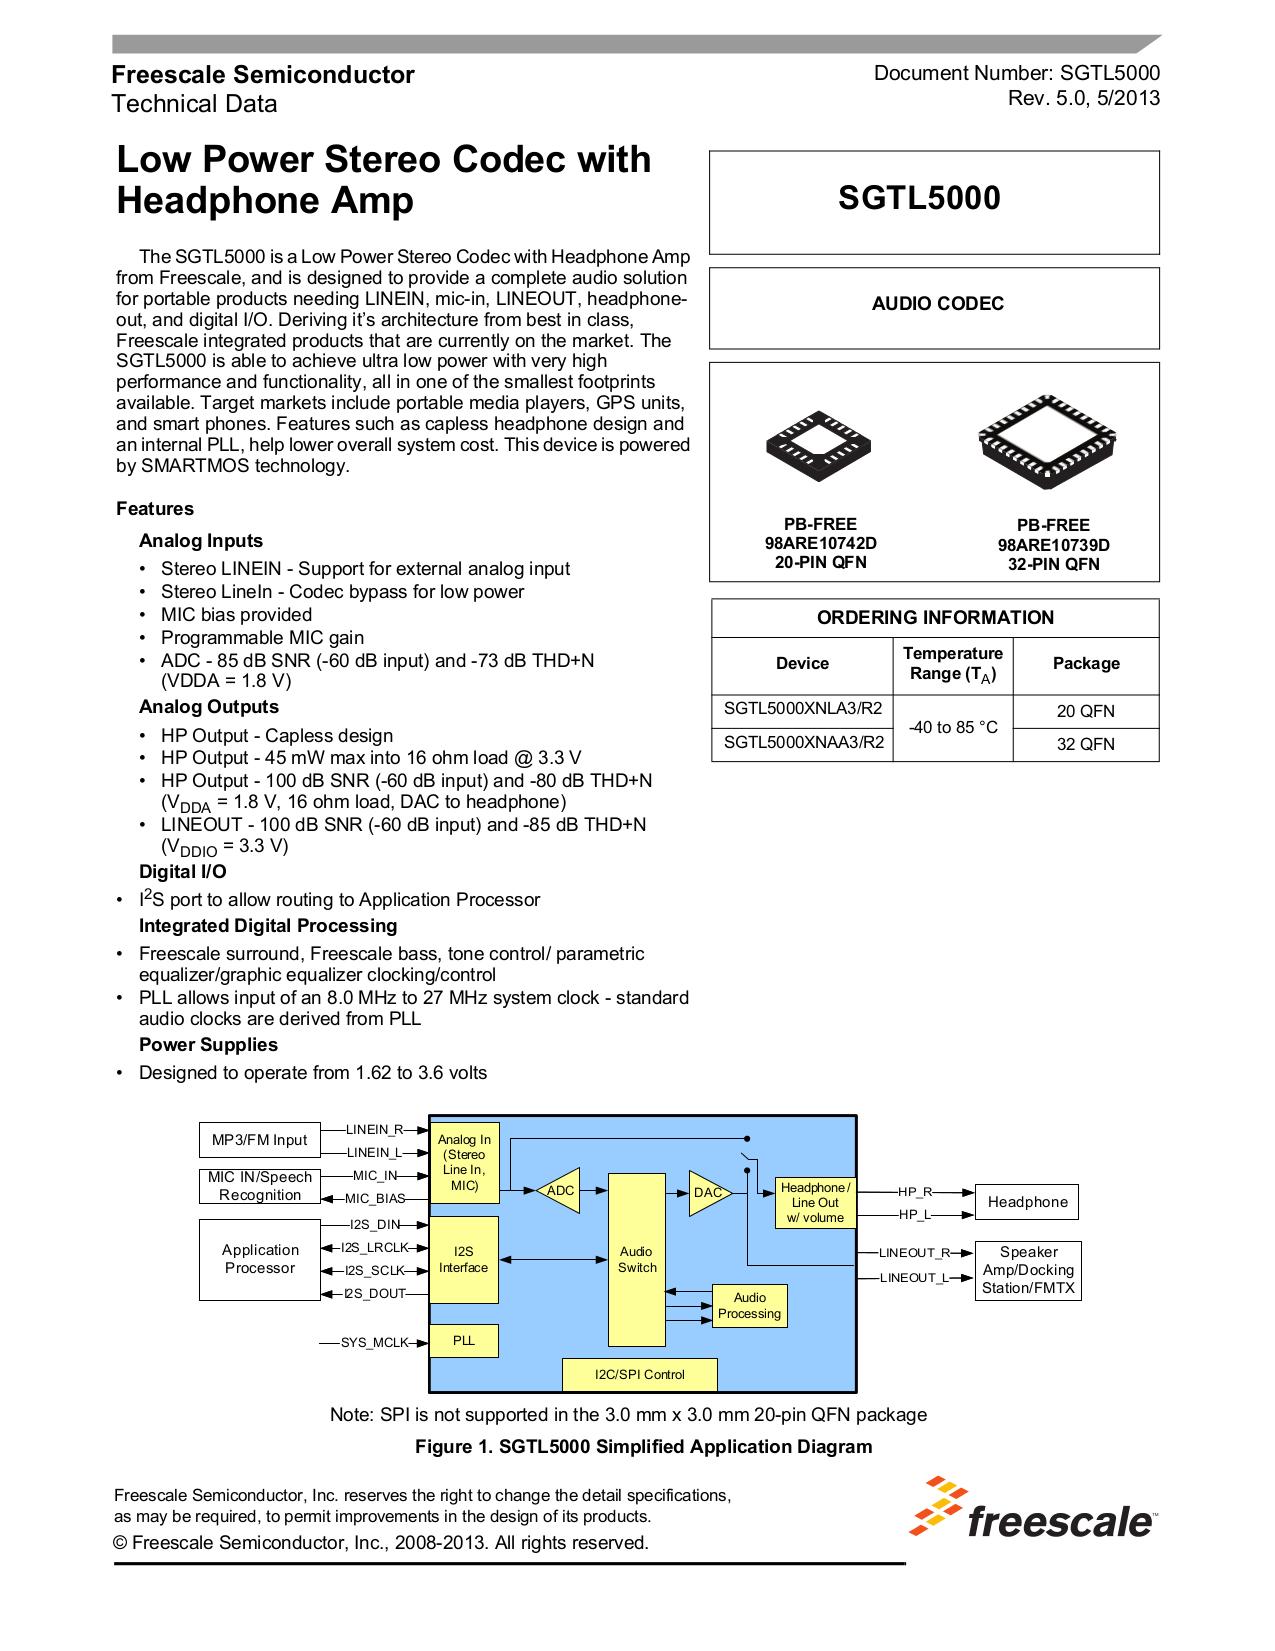 pdf for JVC Headphone HA-S360 manual